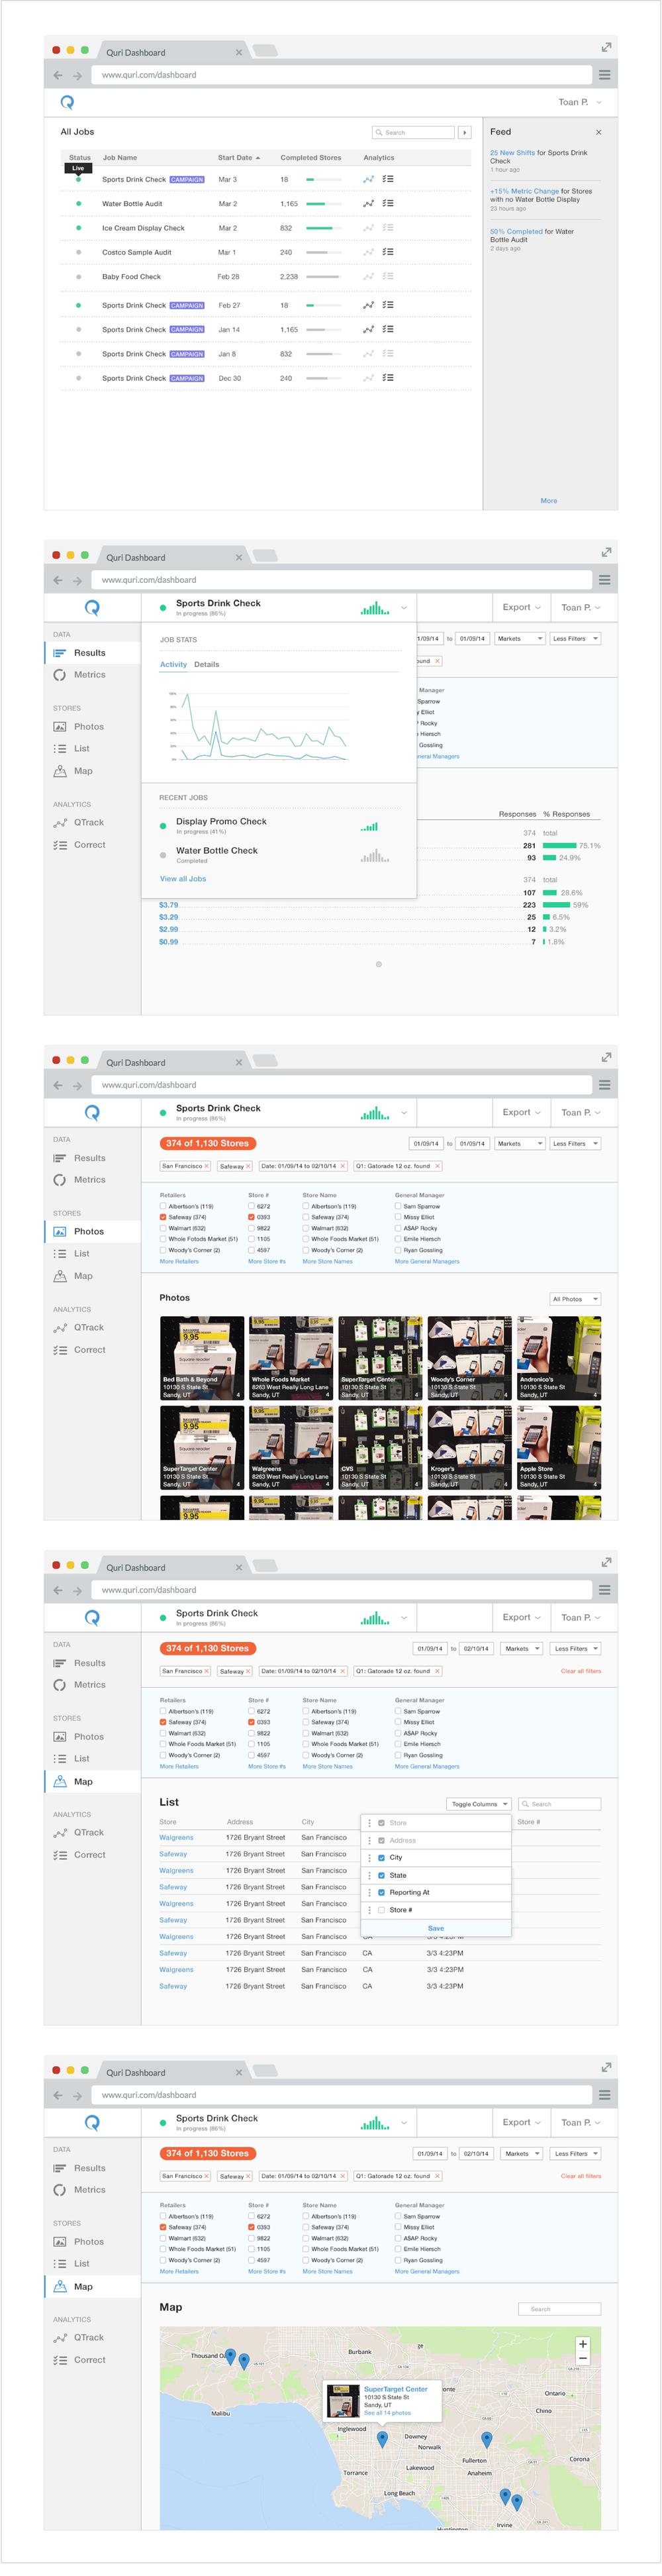 Fig 2. Quri web app (responsive),2014